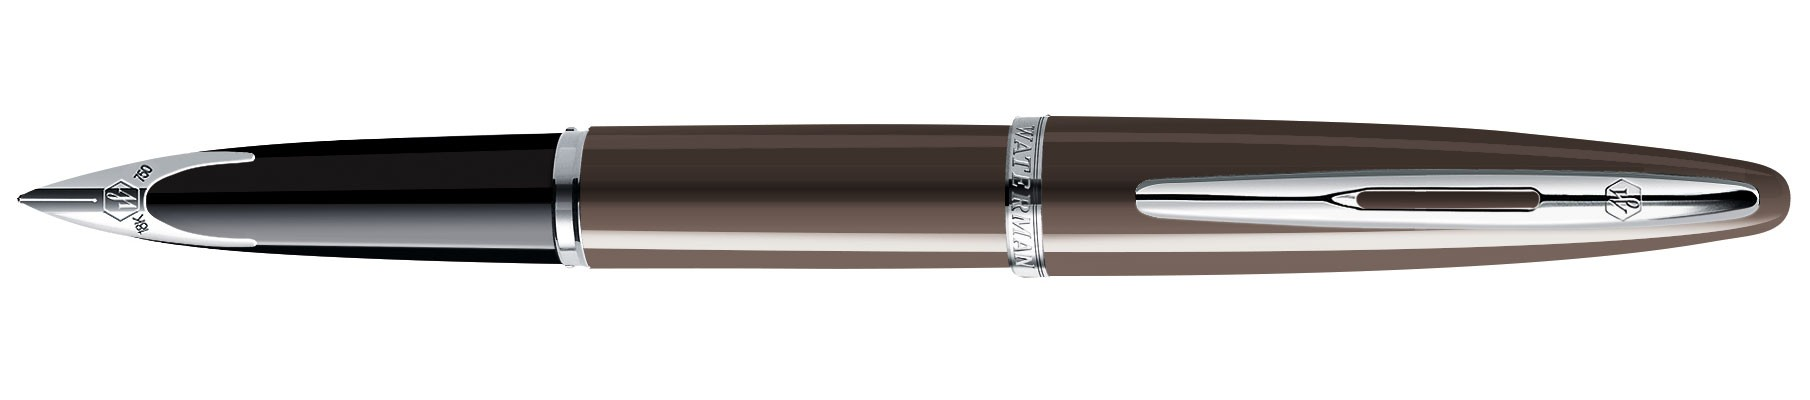 Перьевая ручка Waterman Carene Frosty Brown Lacquer ST